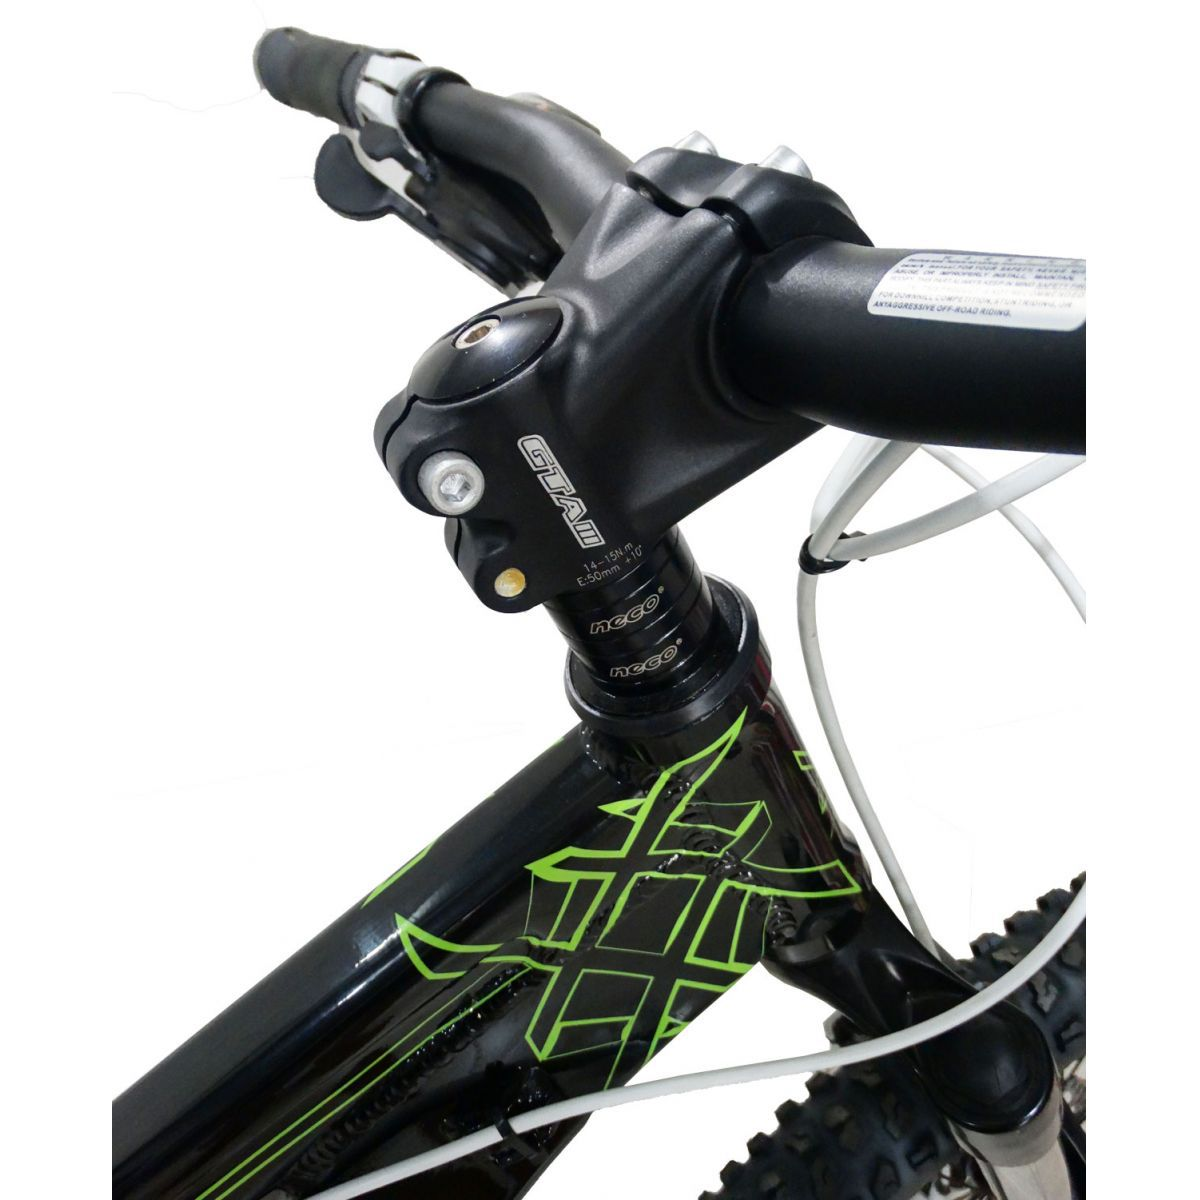 Bicicleta HUPI Naja aro 26 - 24V Micro Shift -  Freio Hidráulico